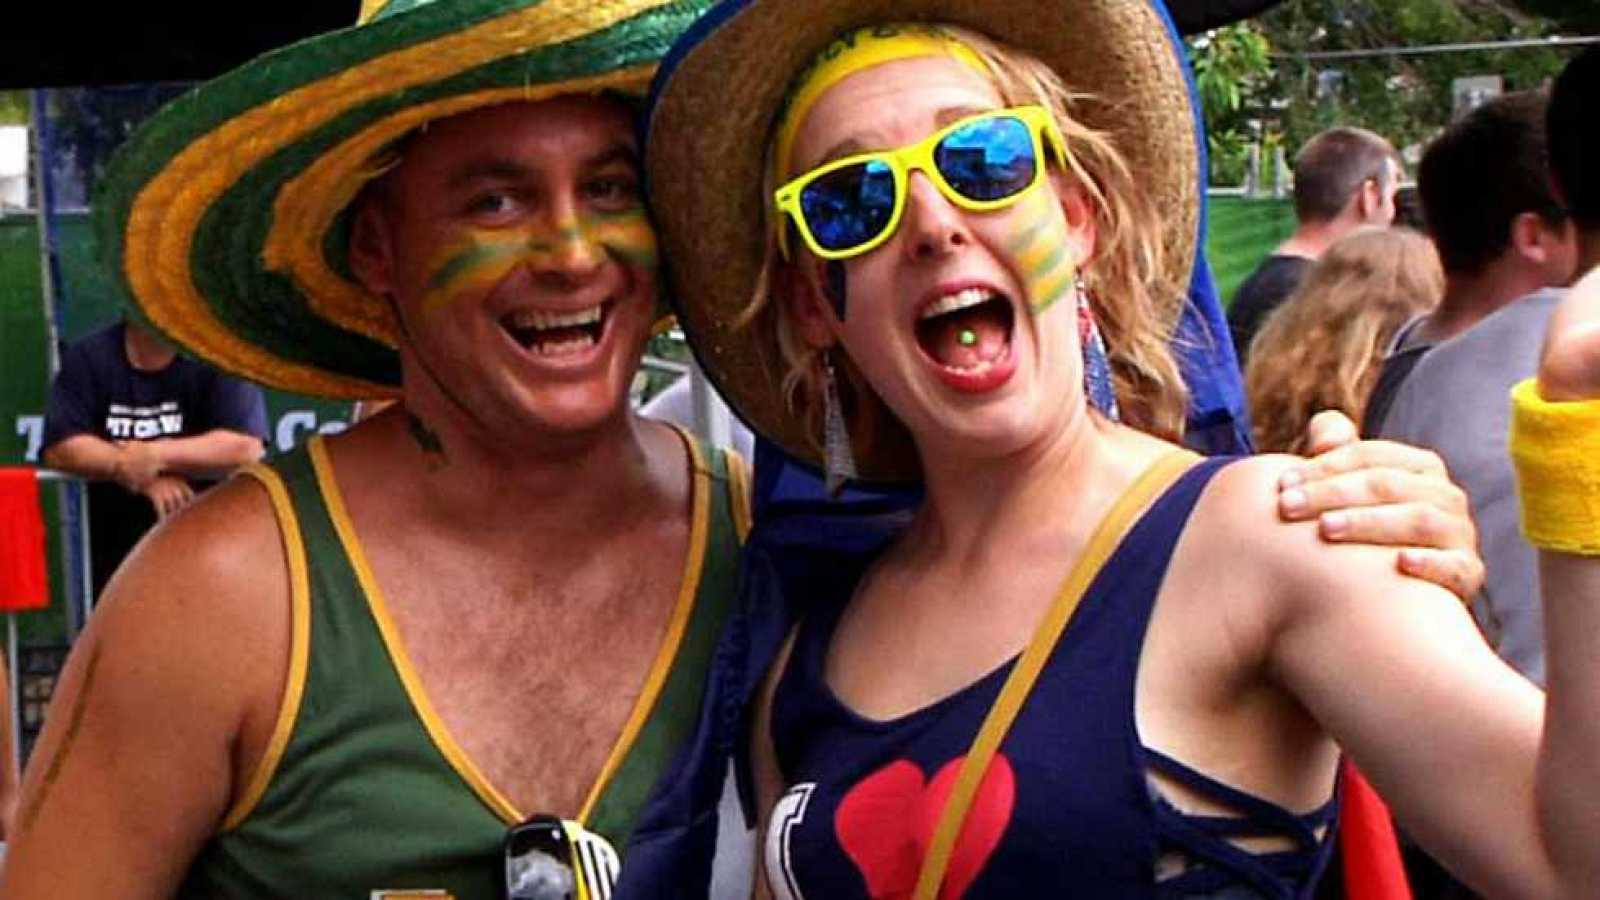 Españoles en el mundo - Brisbane (Australia) - RTVE.es